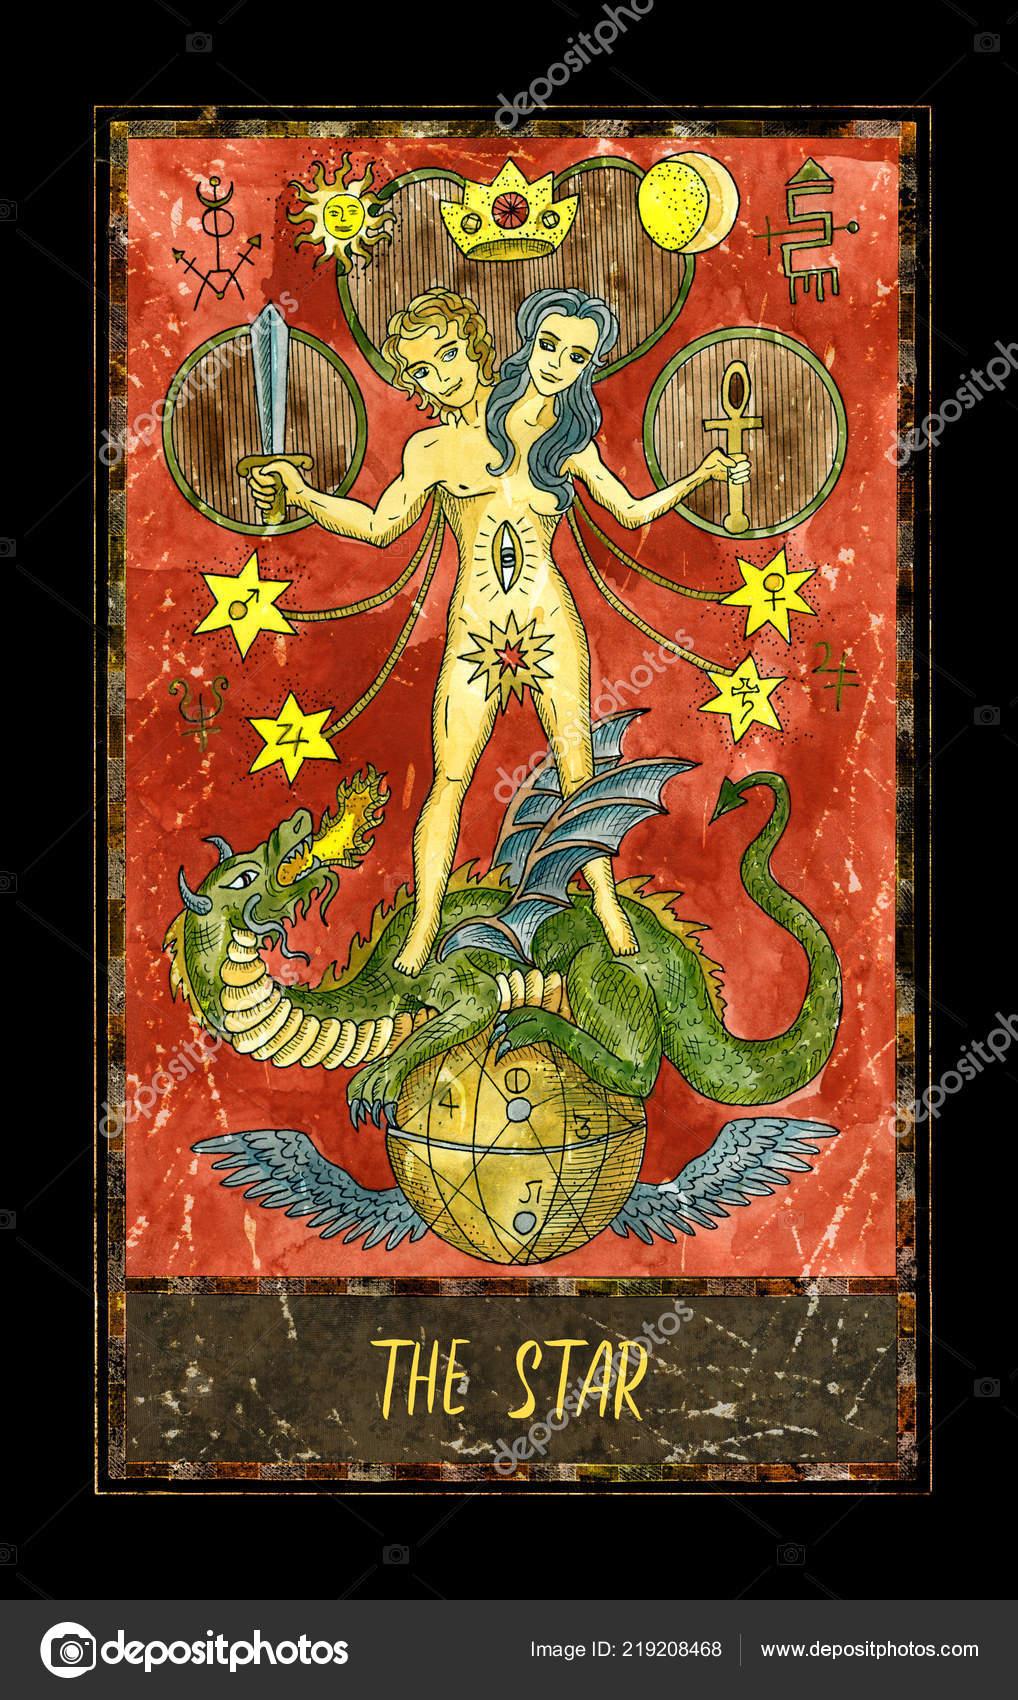 Star Major Arcana Tarot Card Magic Gate Deck Fantasy Graphic